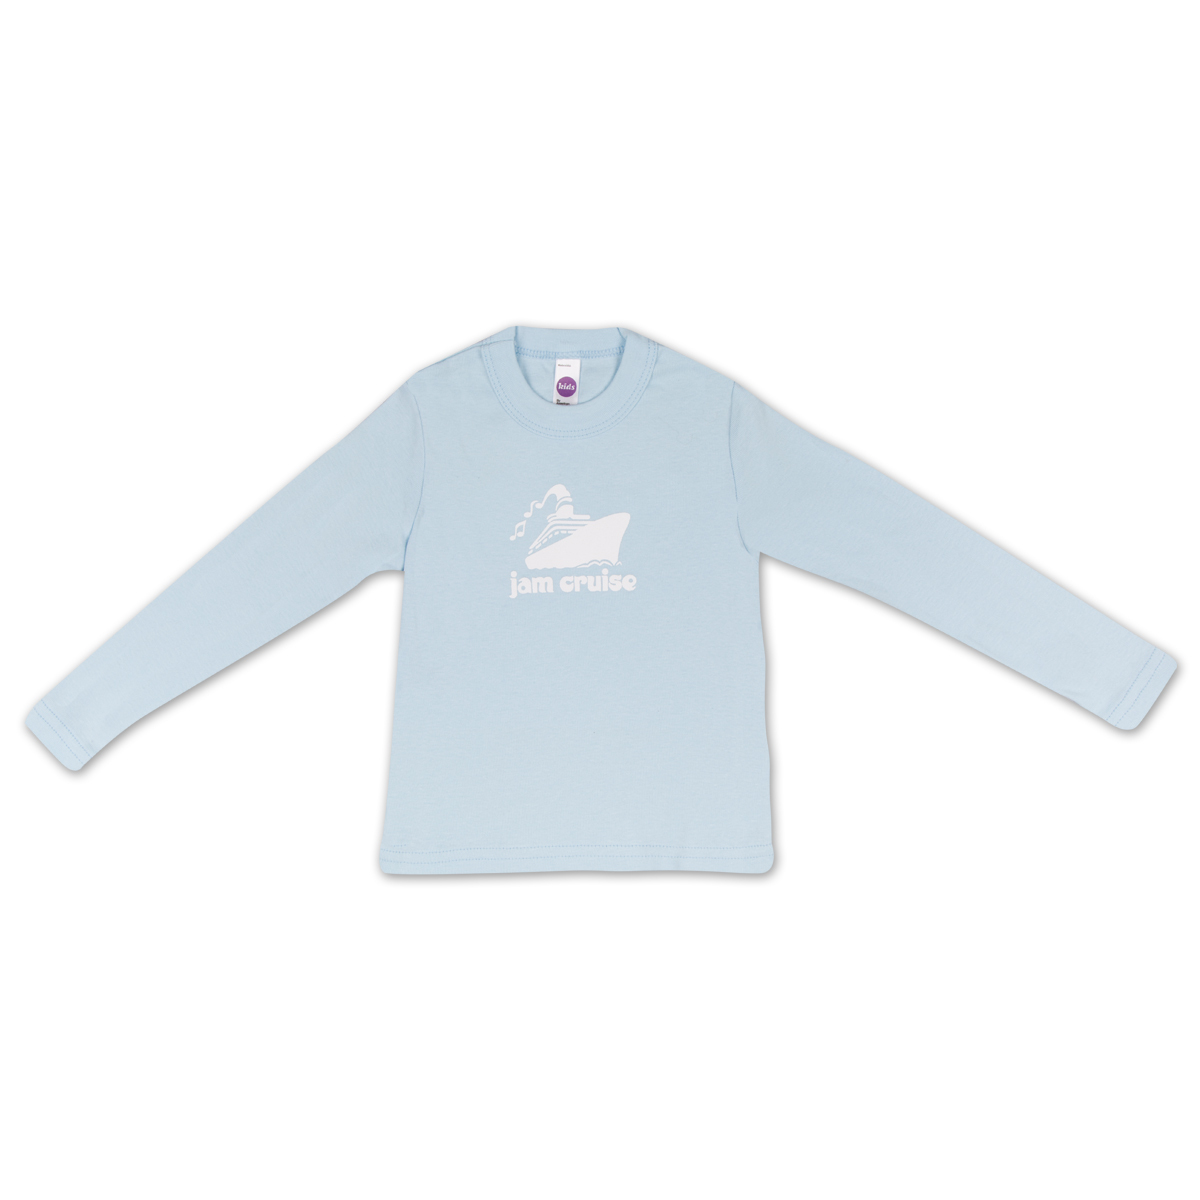 Jam Cruise Kids Logo T-Shirt (Light Blue)